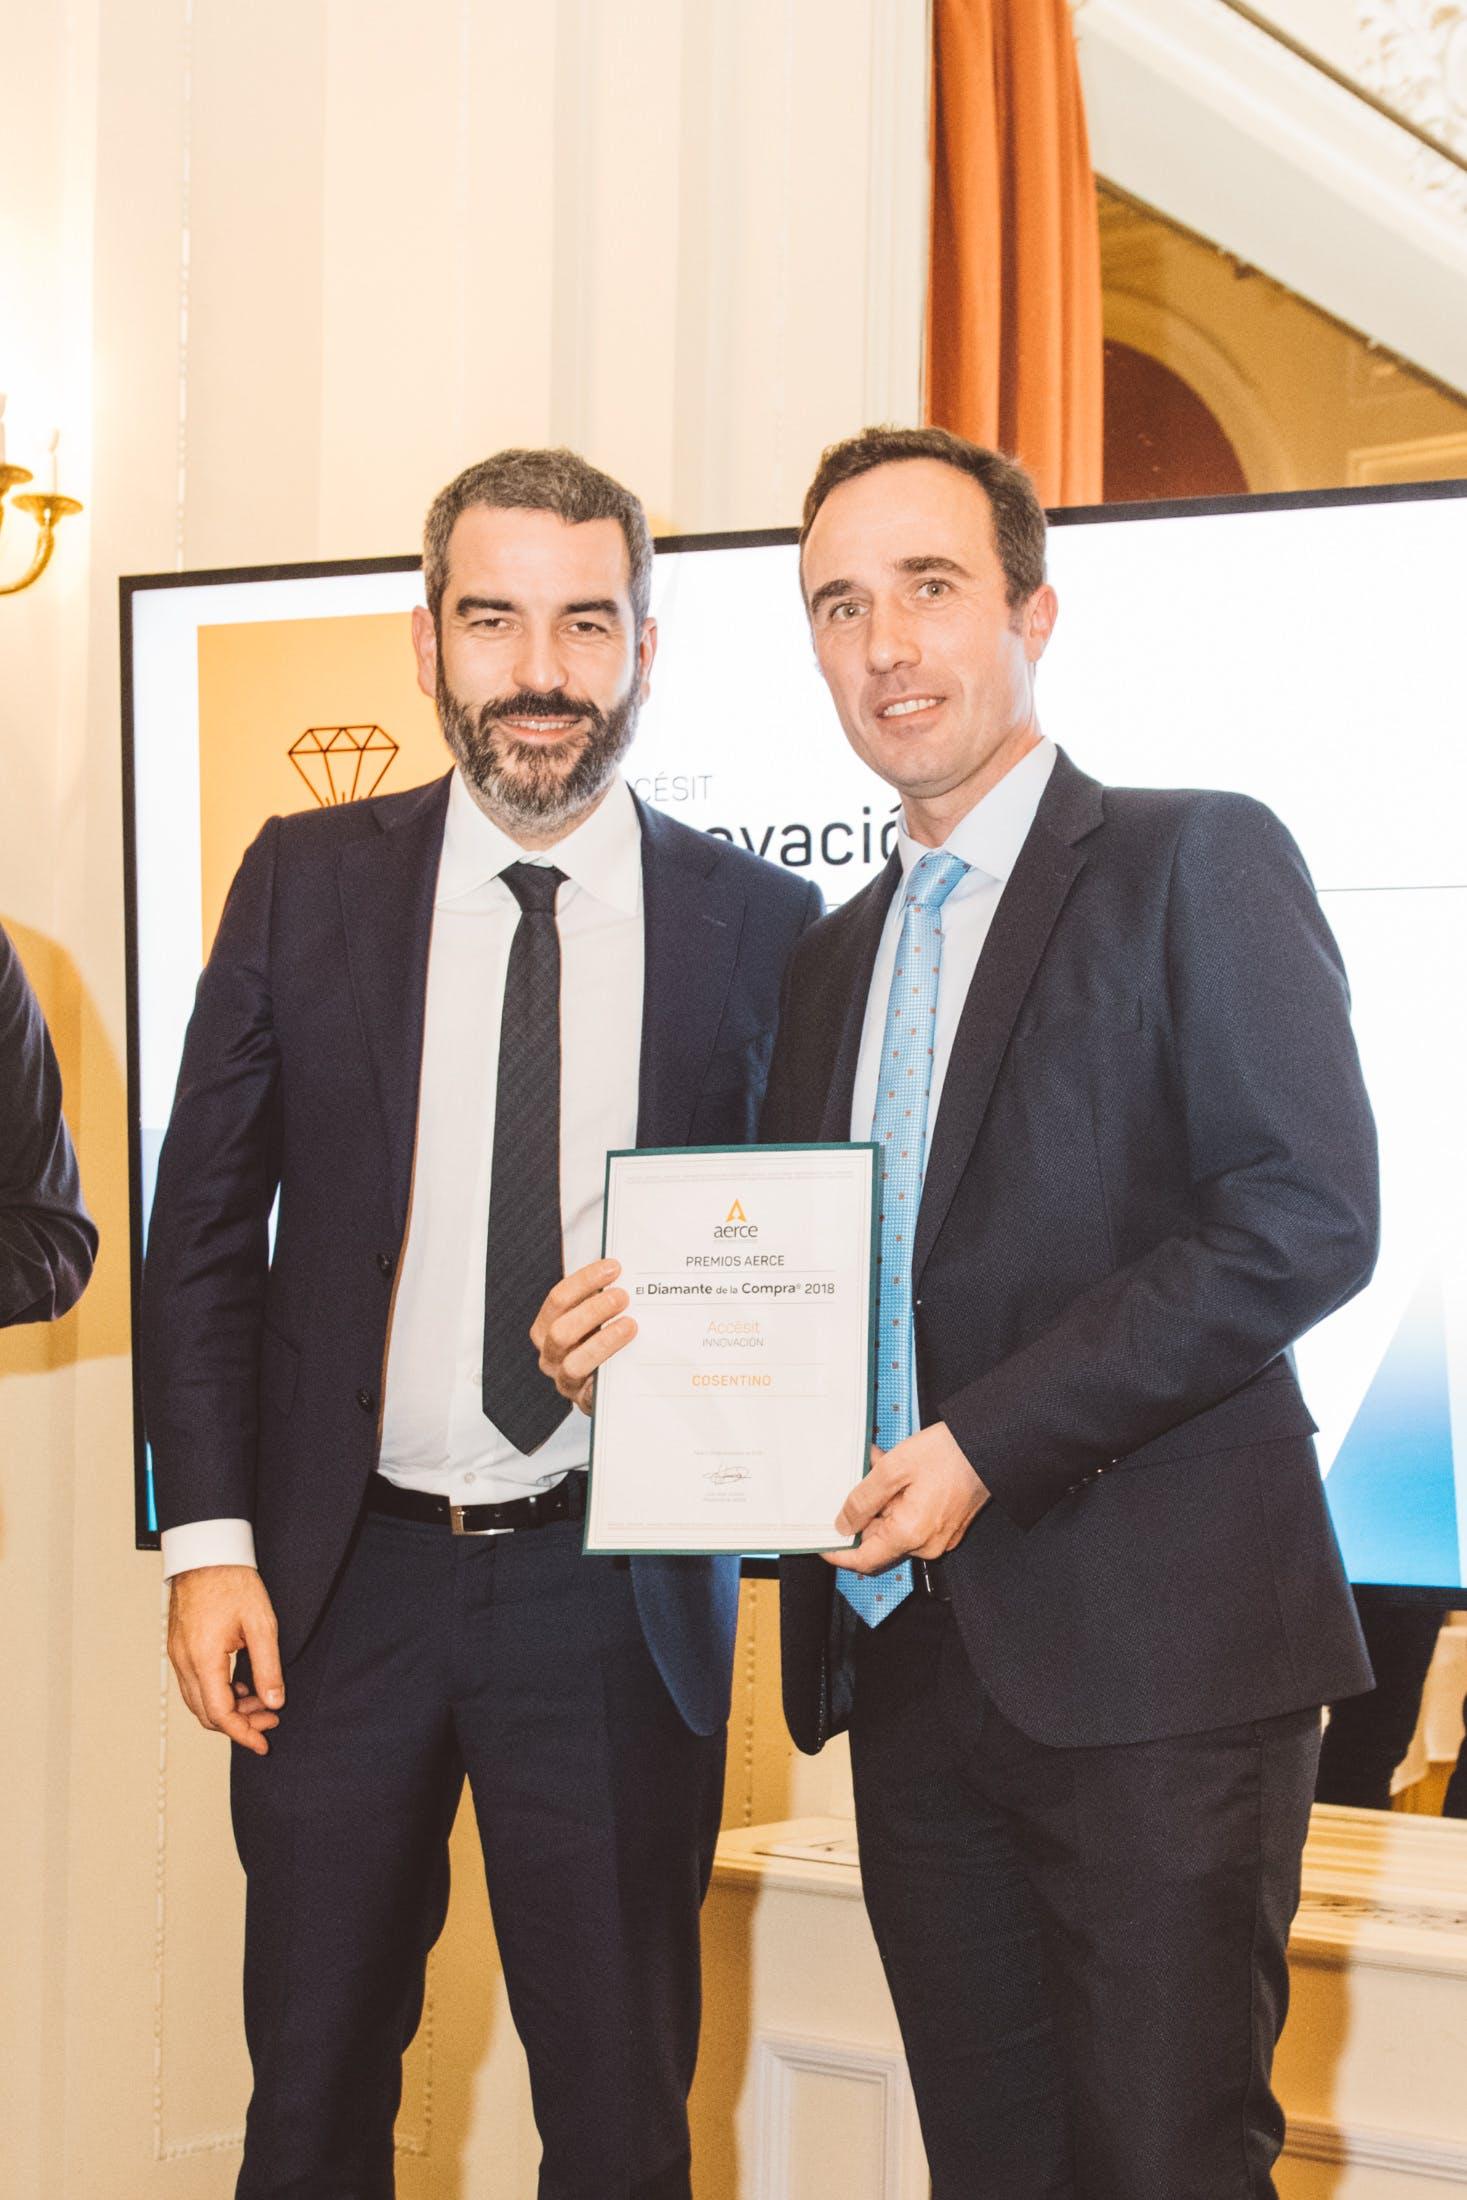 Image of Cosentino Premios Aerce Premiosdiamante 1 in Cosentino Purchasing department honoured twice - Cosentino